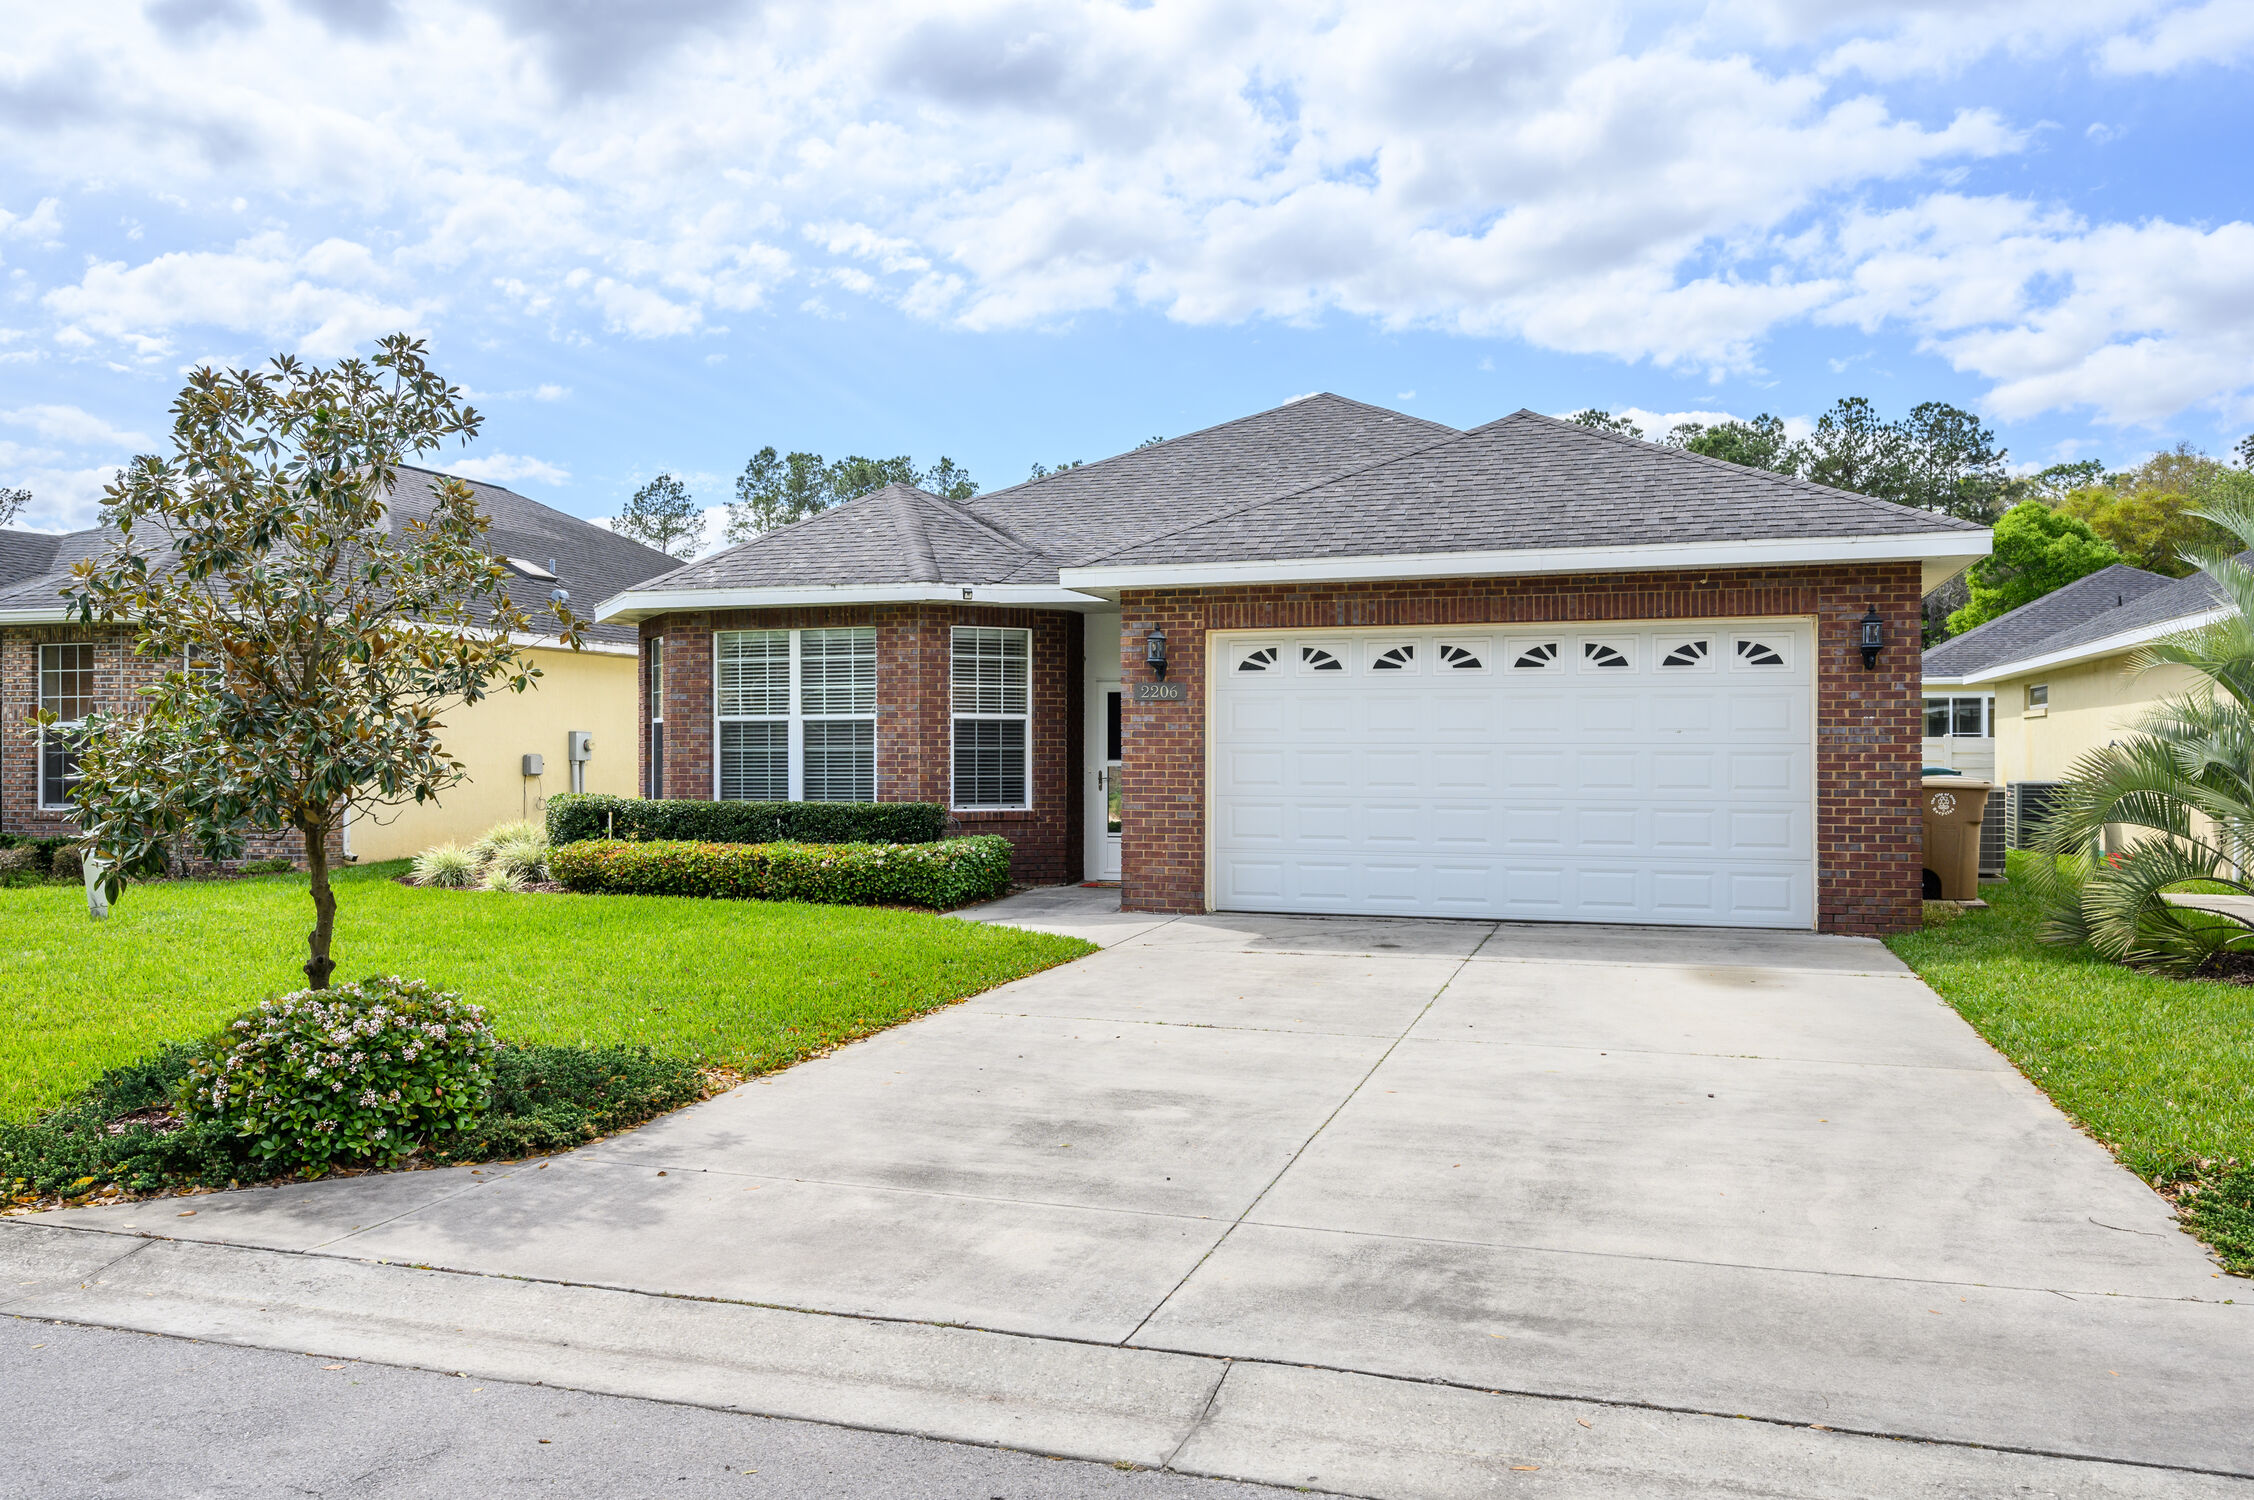 2206 NE 38th Terrace Ocala, Florida, 34470 - Ocala fl home for sale